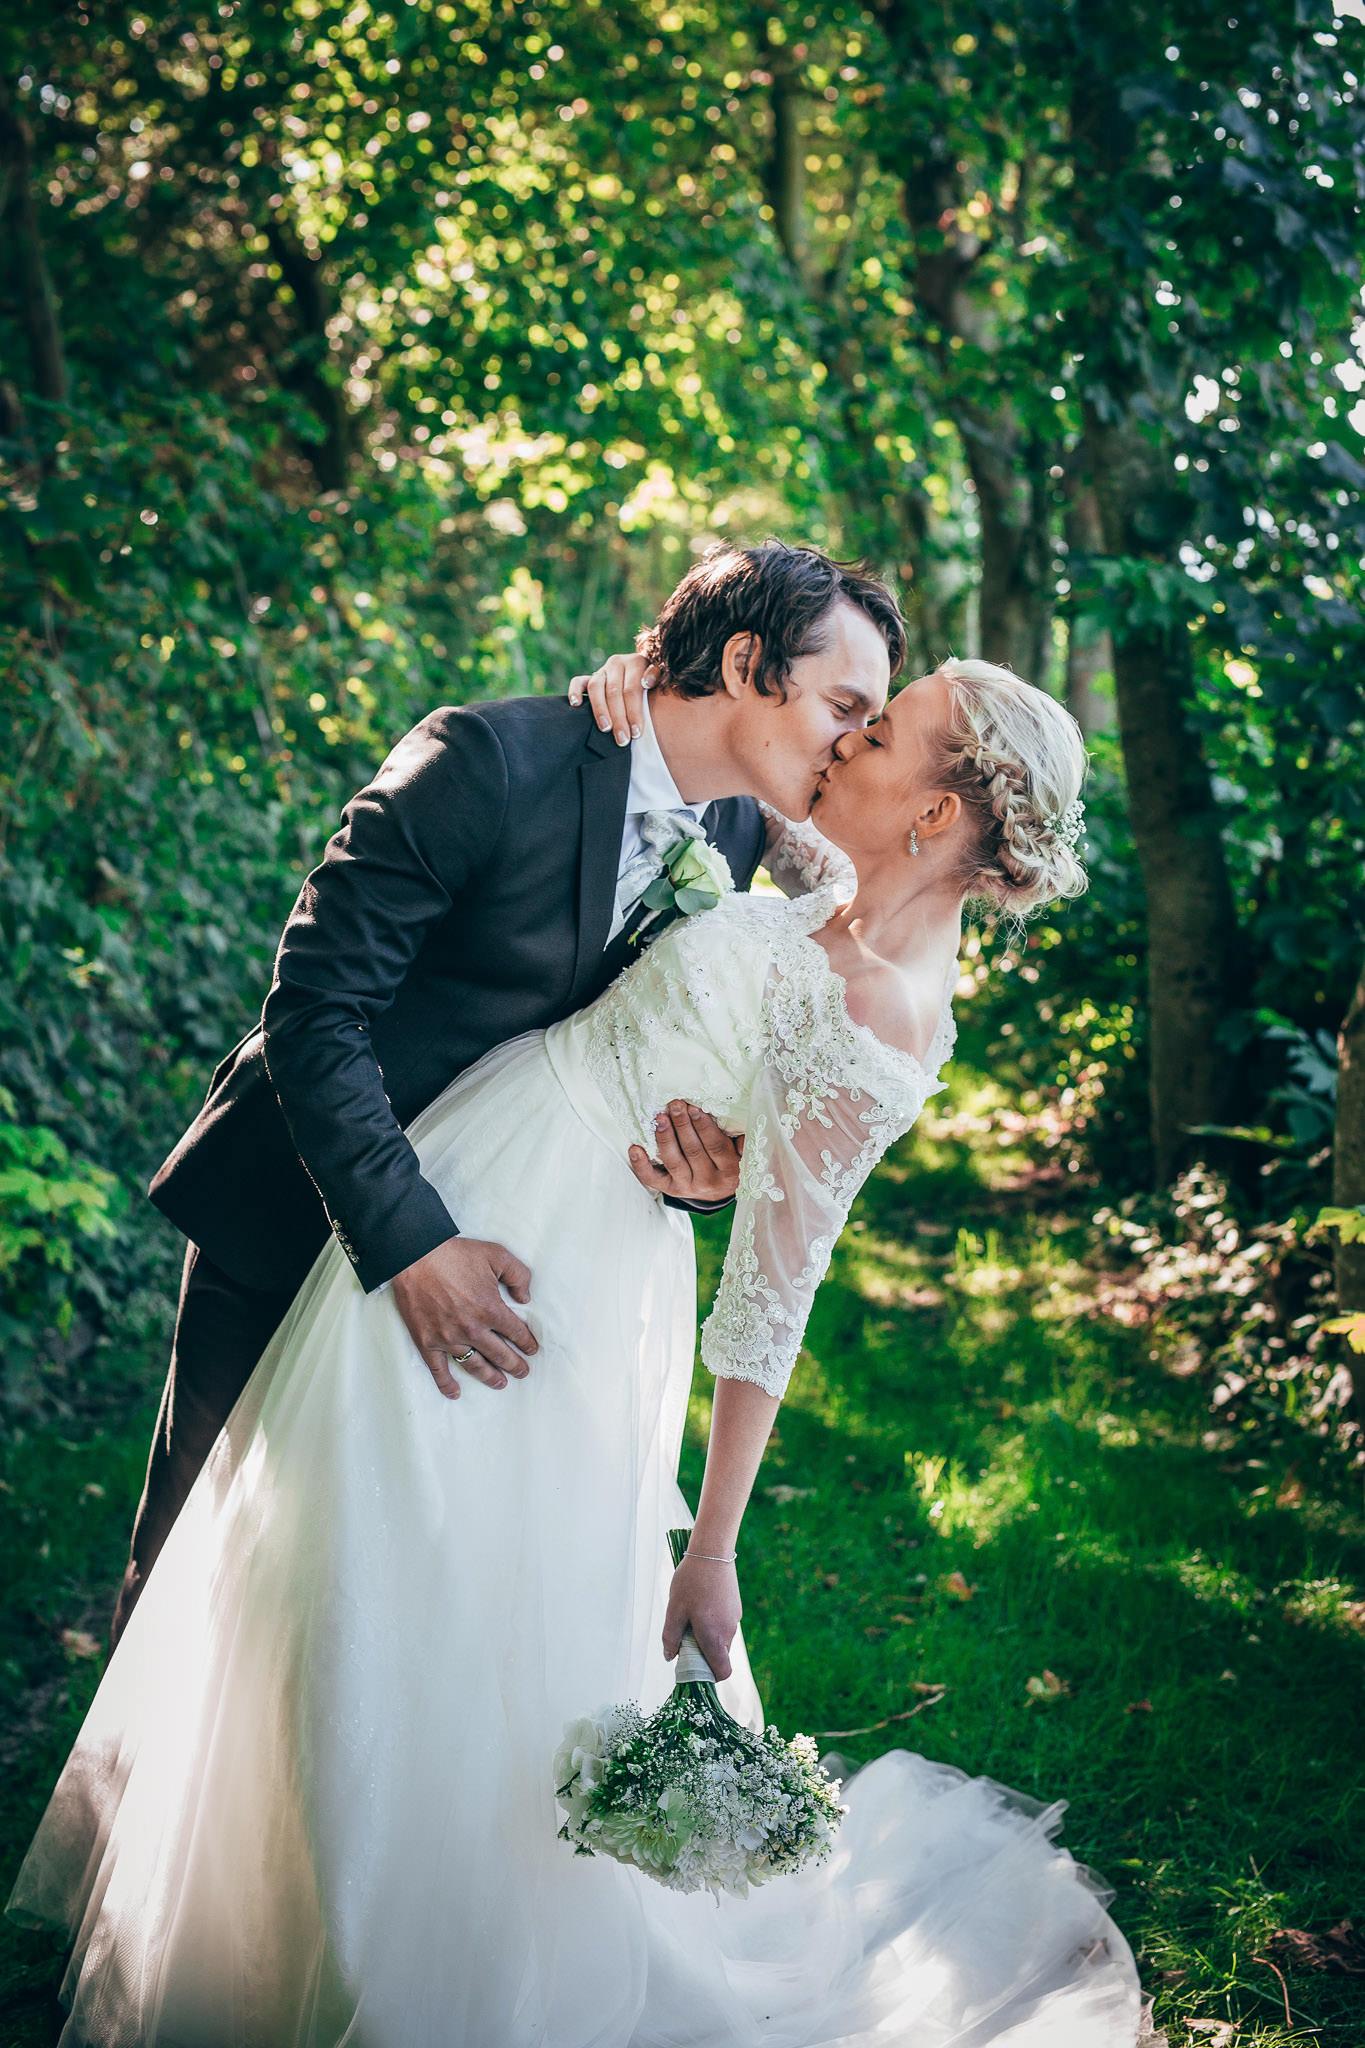 Wedding+Photographer+Norway+Bryllupsfotograf+Casey+Arneson+JT-109.jpg